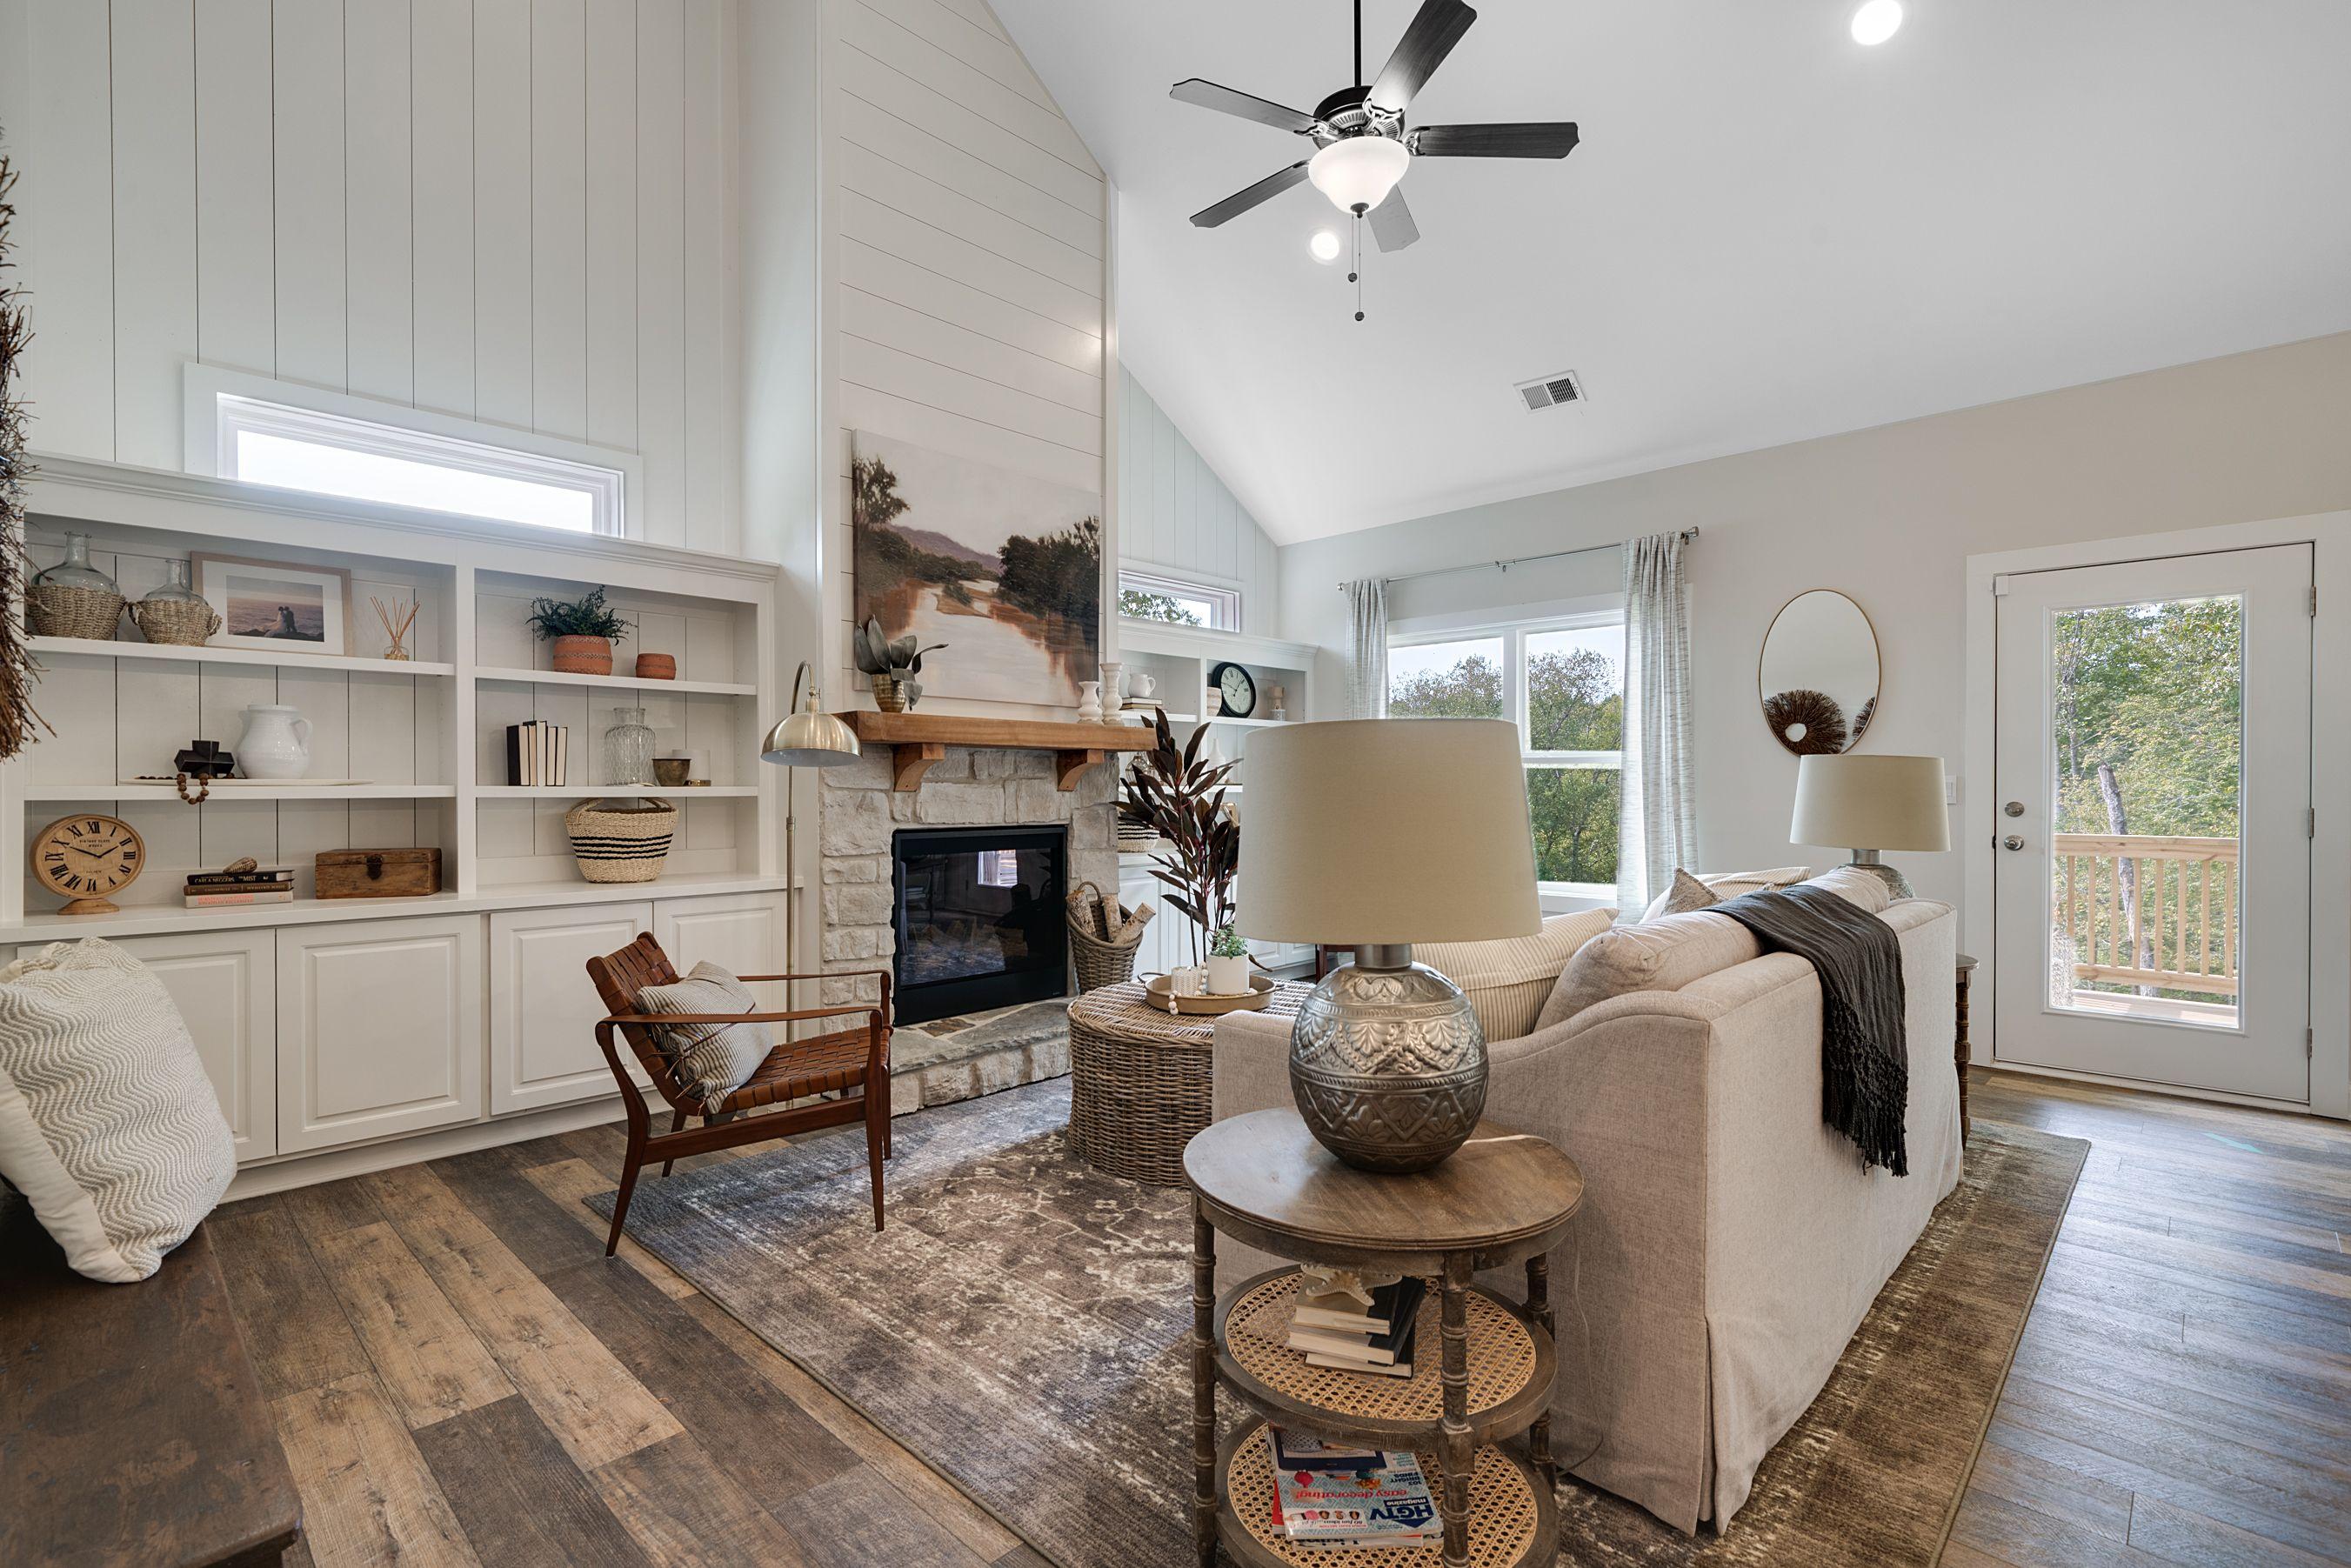 Living Area featured in the Dalton (Farmhouse Series) By Artisan Built Communities in Atlanta, GA